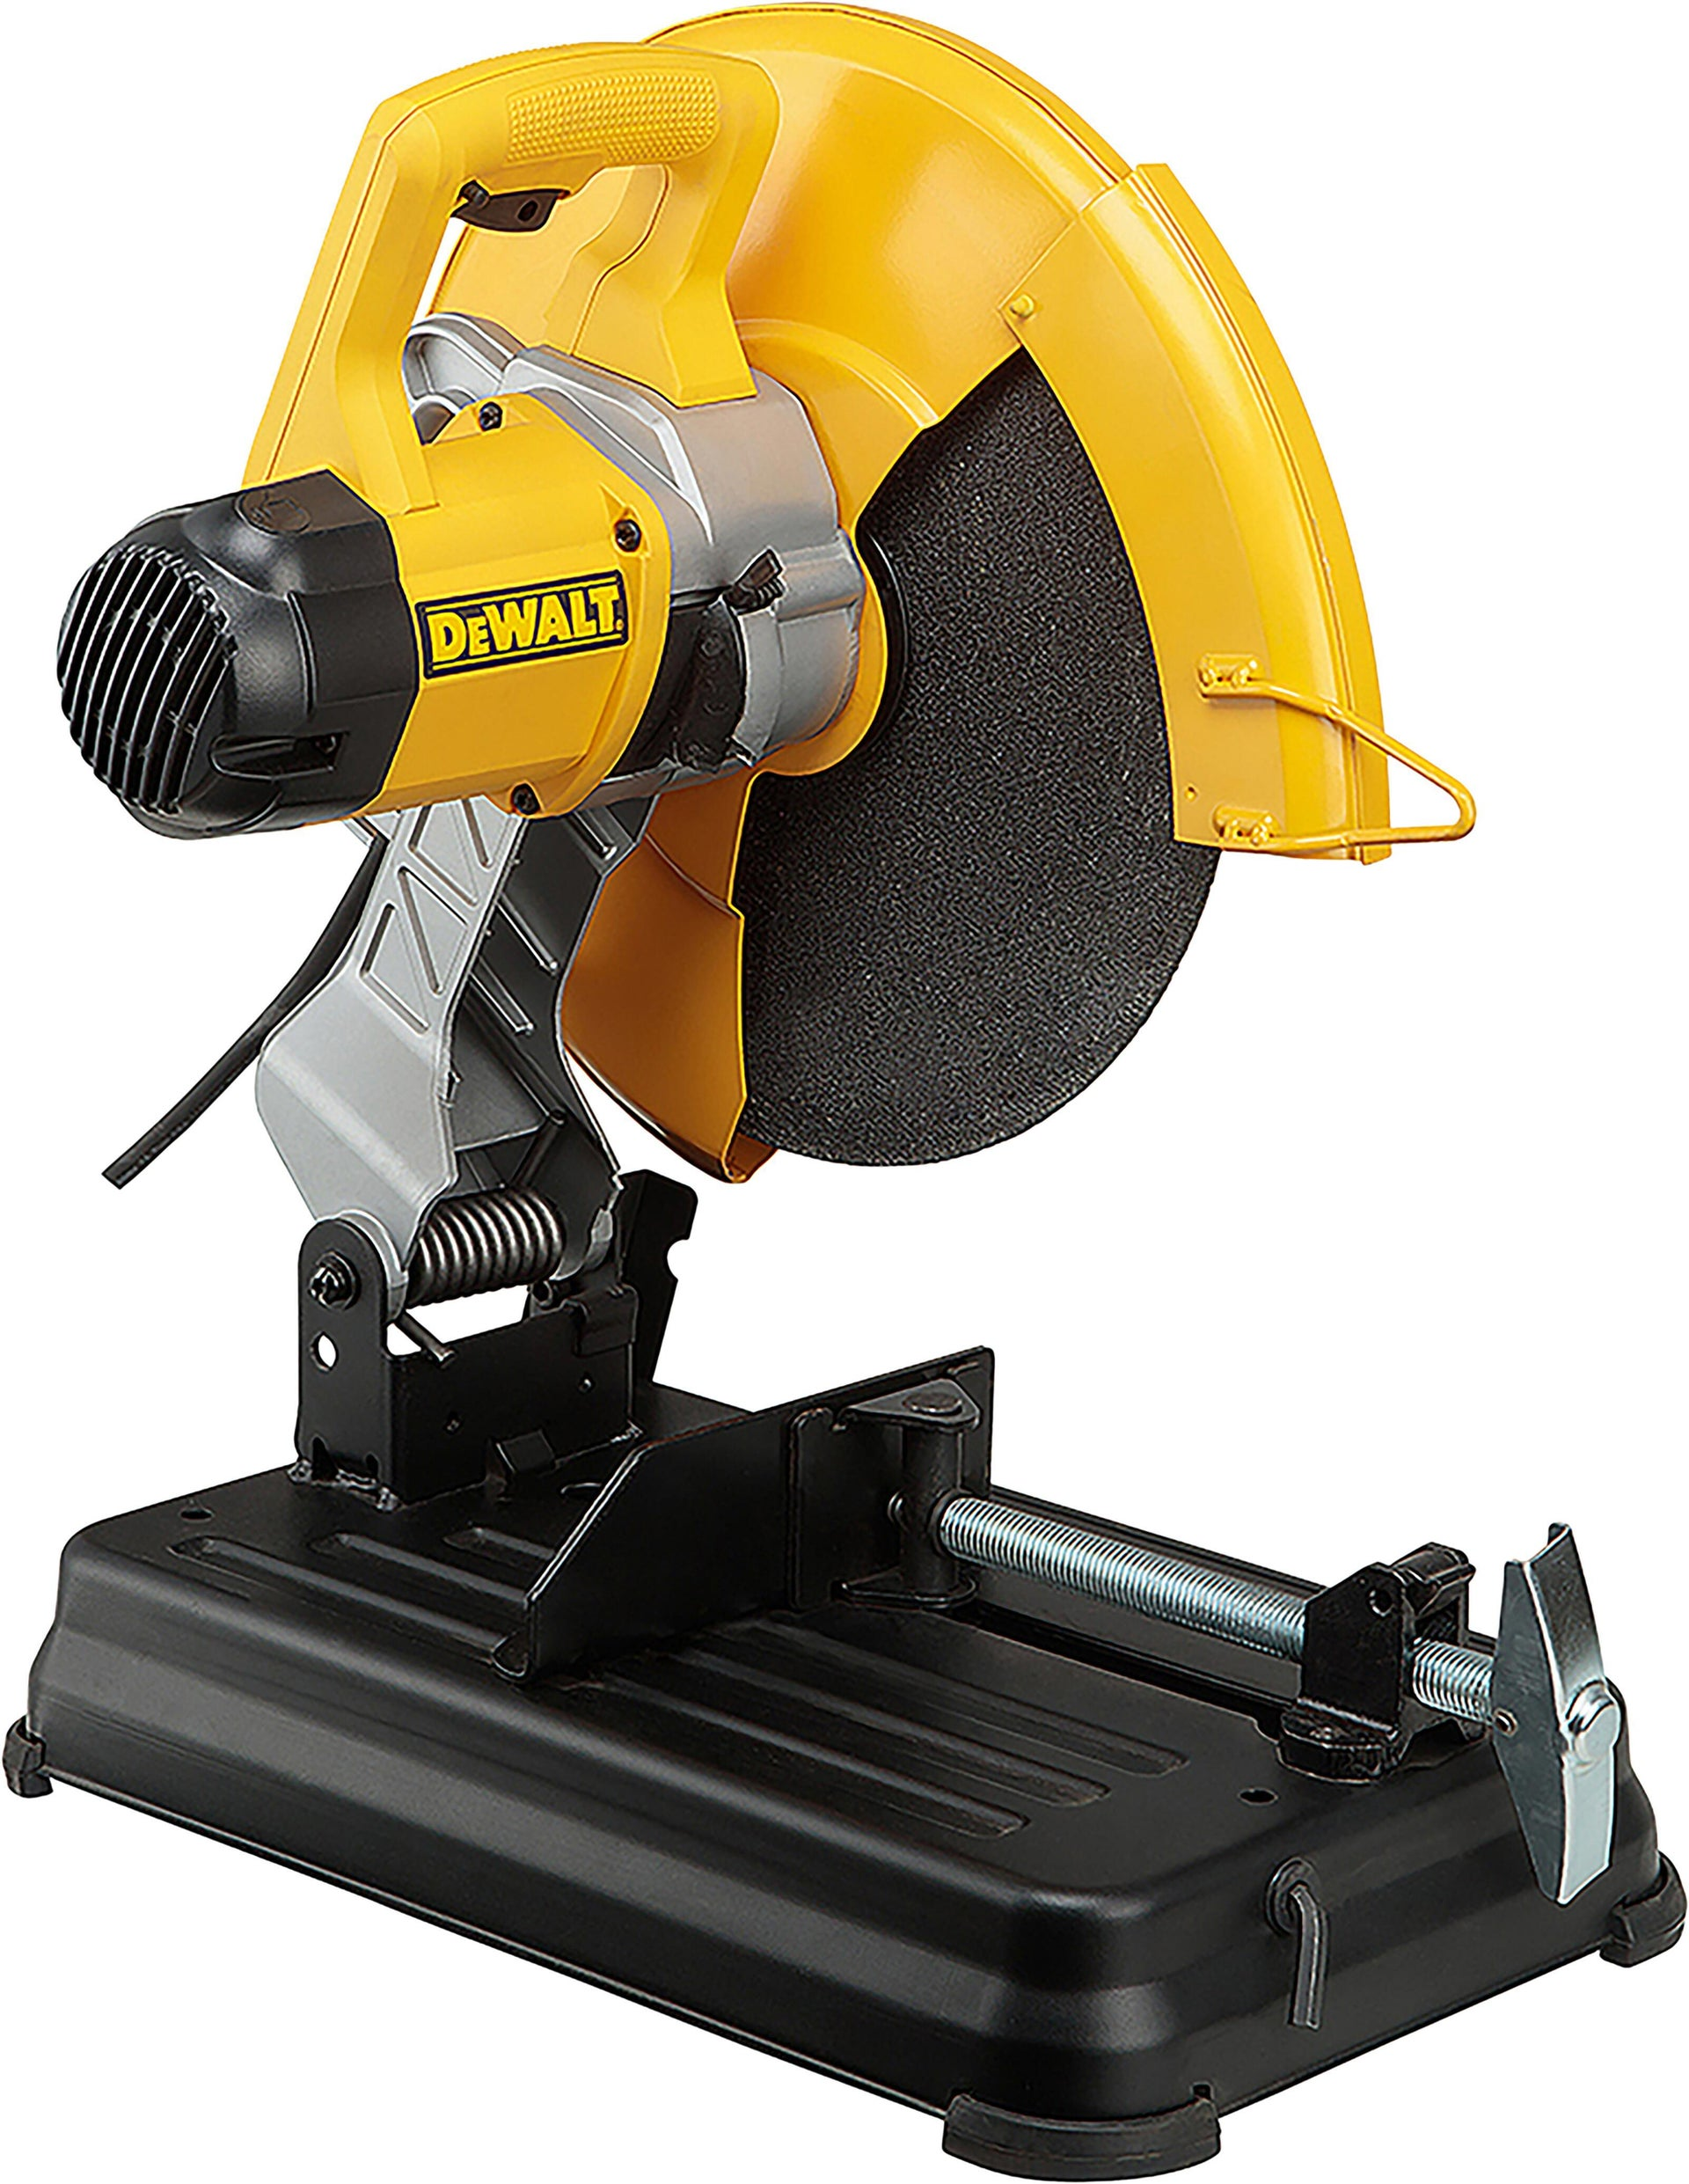 Troncatrice elettrica per metallo DEWALT D28730-QS 2200 W